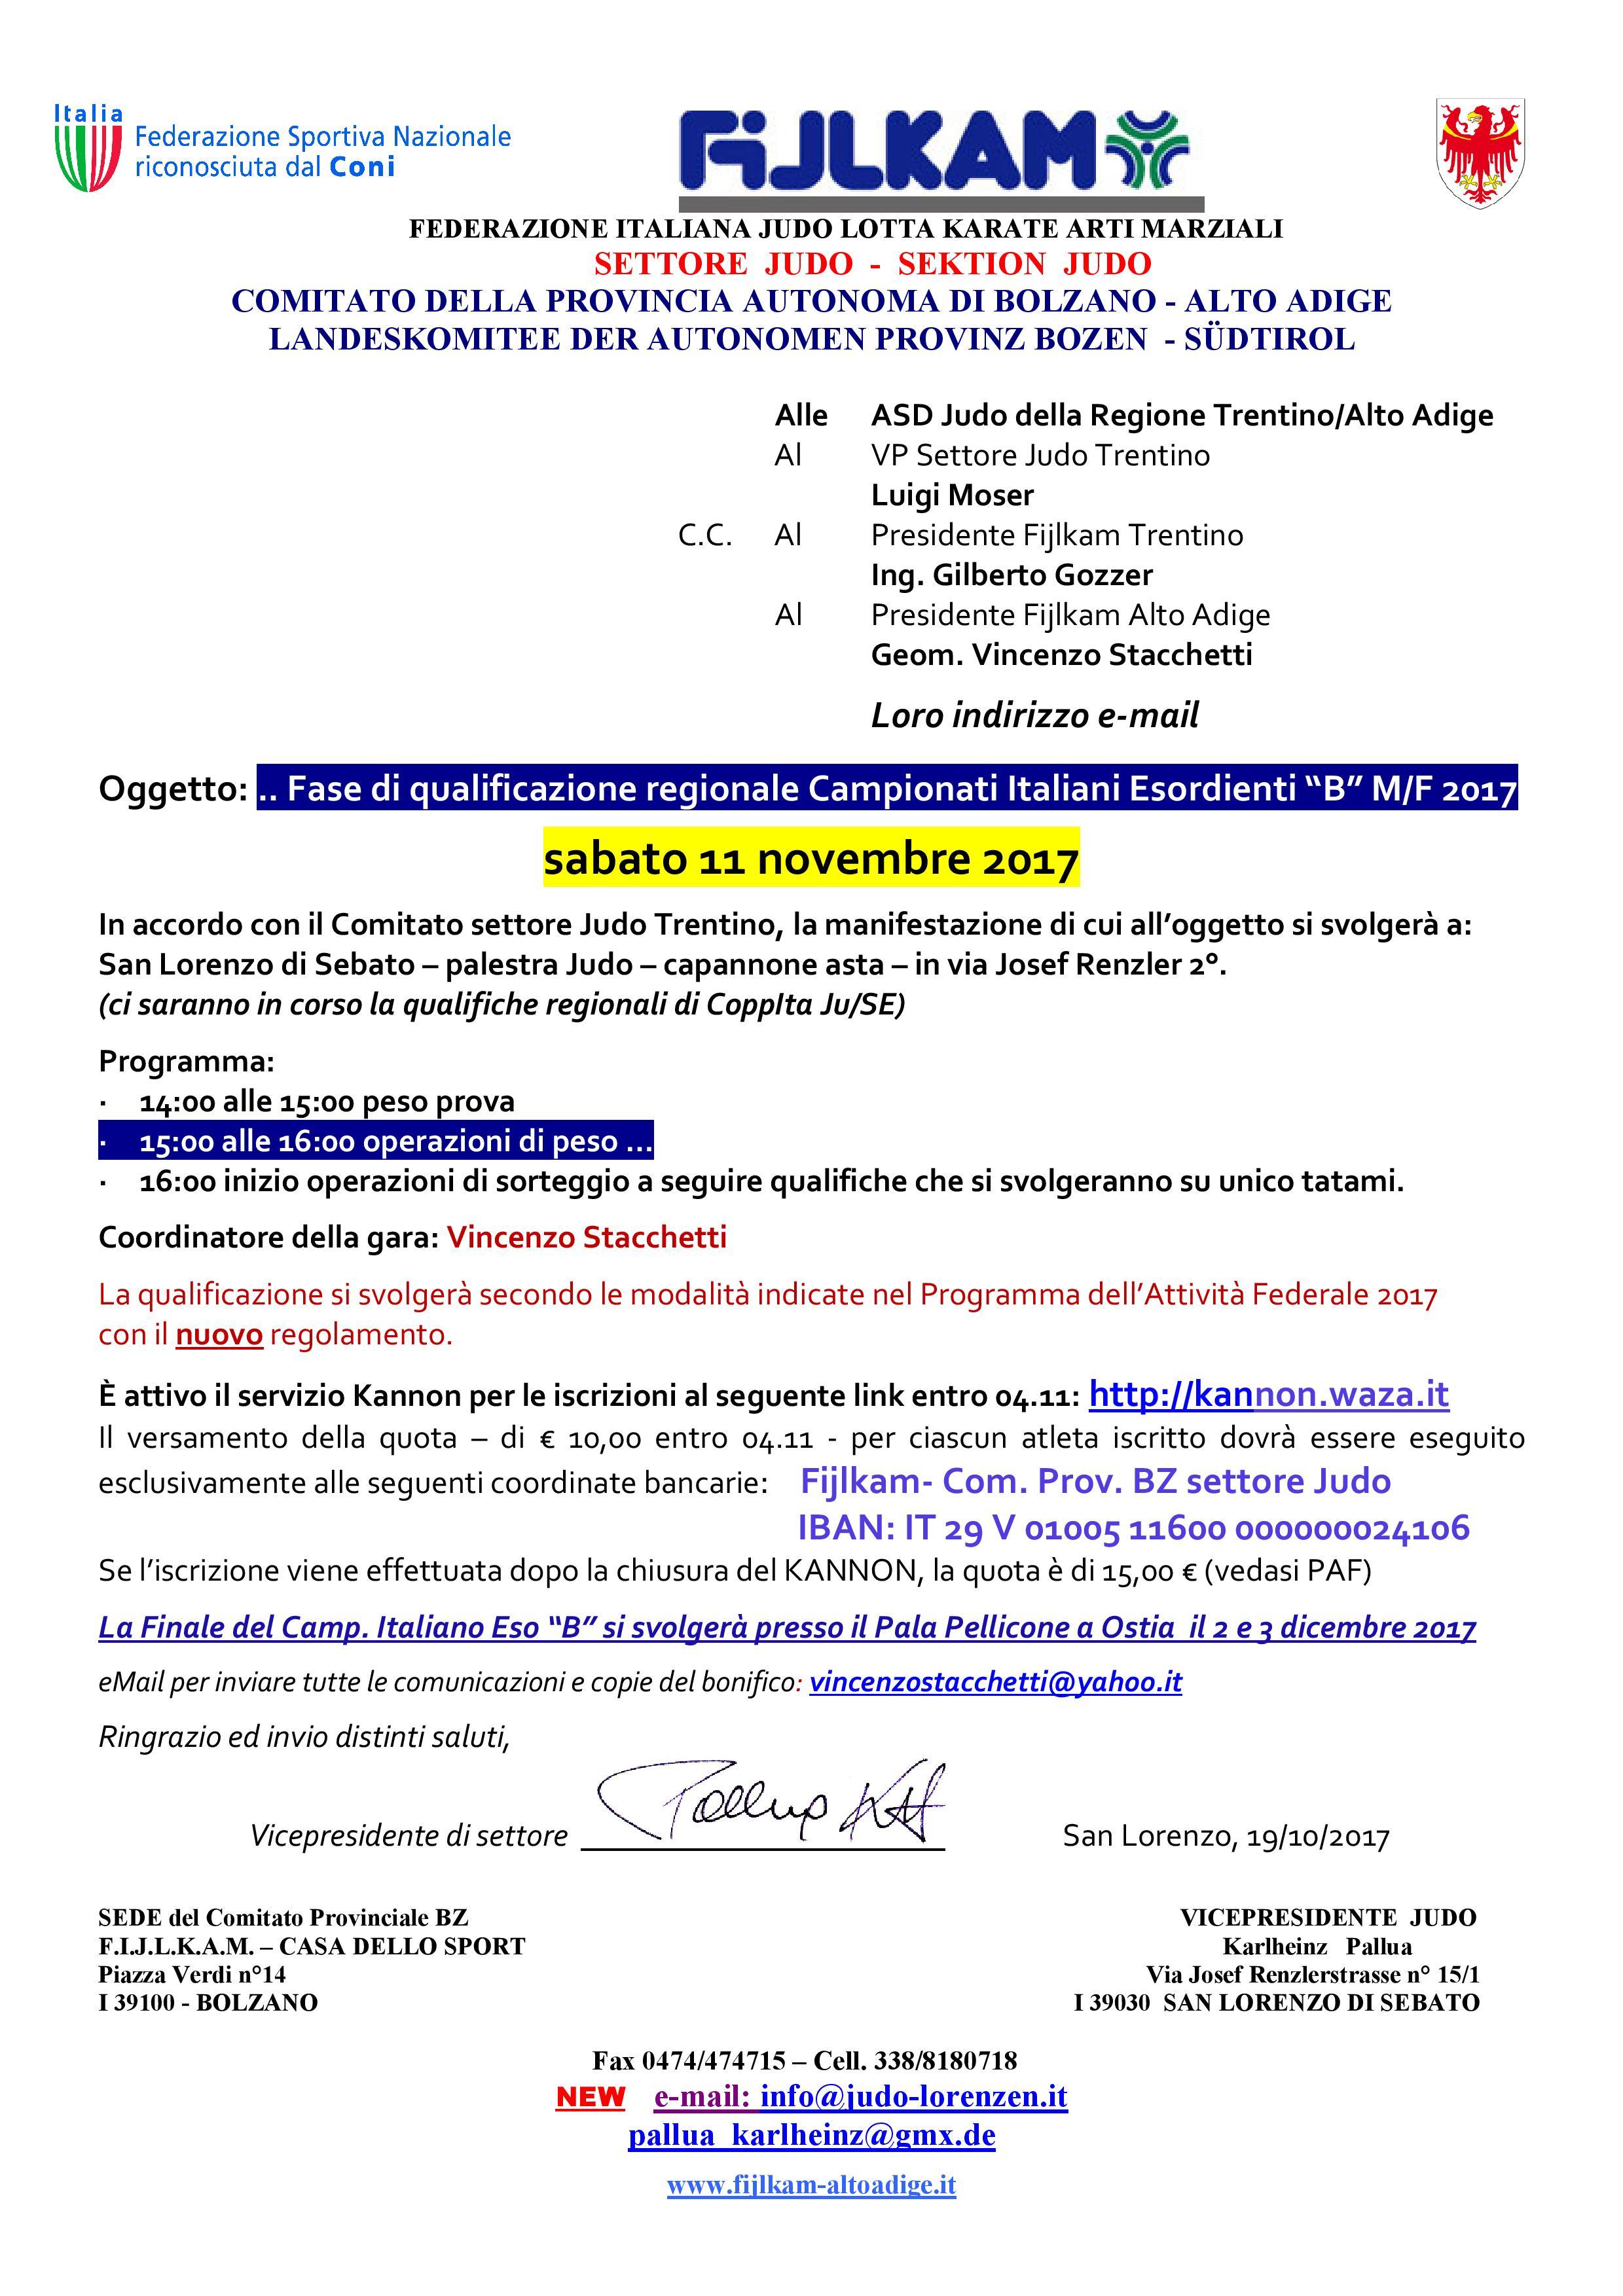 Calendario Aste Bolzano.Calendario Eventi E Gare A S D Judokwai Bolzano